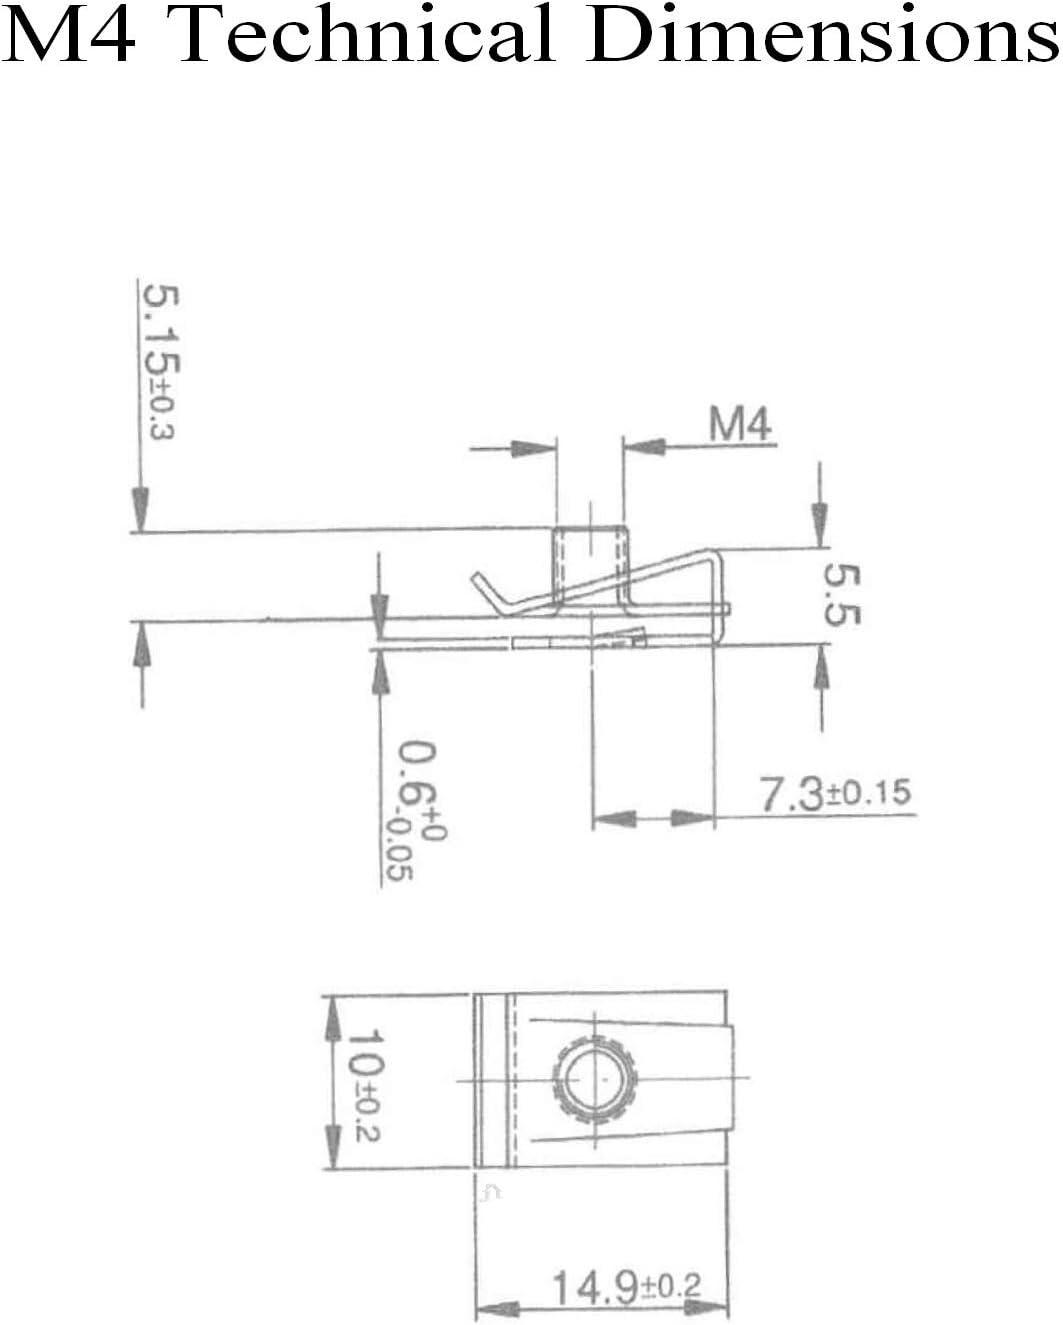 No 4 10 x Speed Fastener U Nuts Interior Trim Panel Self Tapping Screw Spire Clips